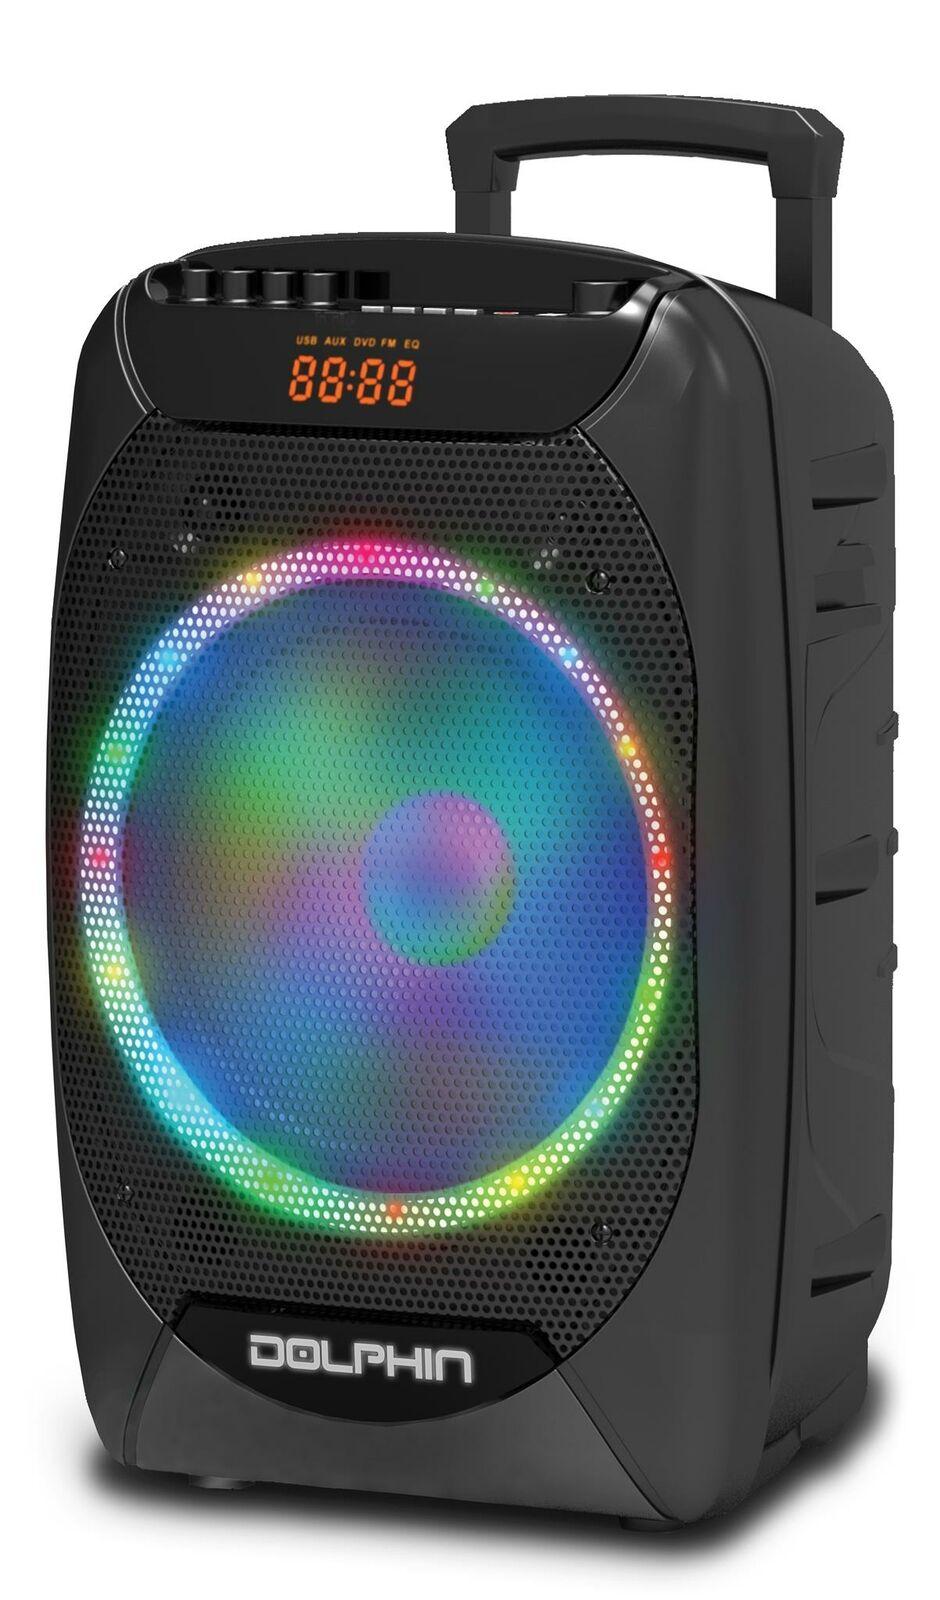 Dolphin SP-1550RBT 15  Portable Blautooth Speaker